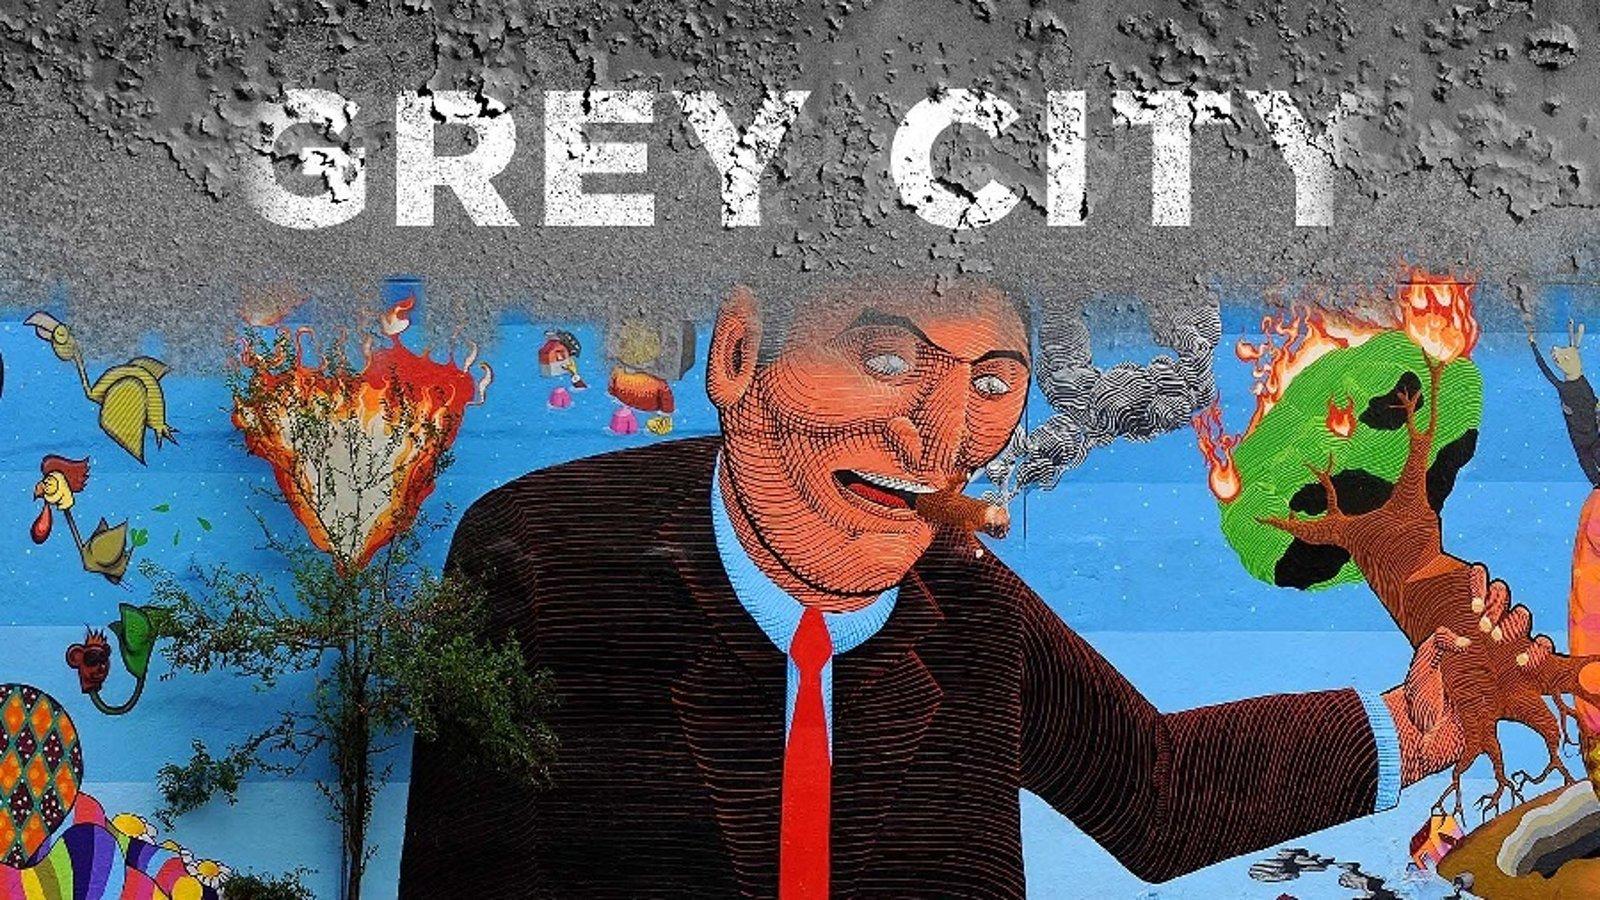 Grey City - Artists Use Graffiti as Political Resistance in Brazil